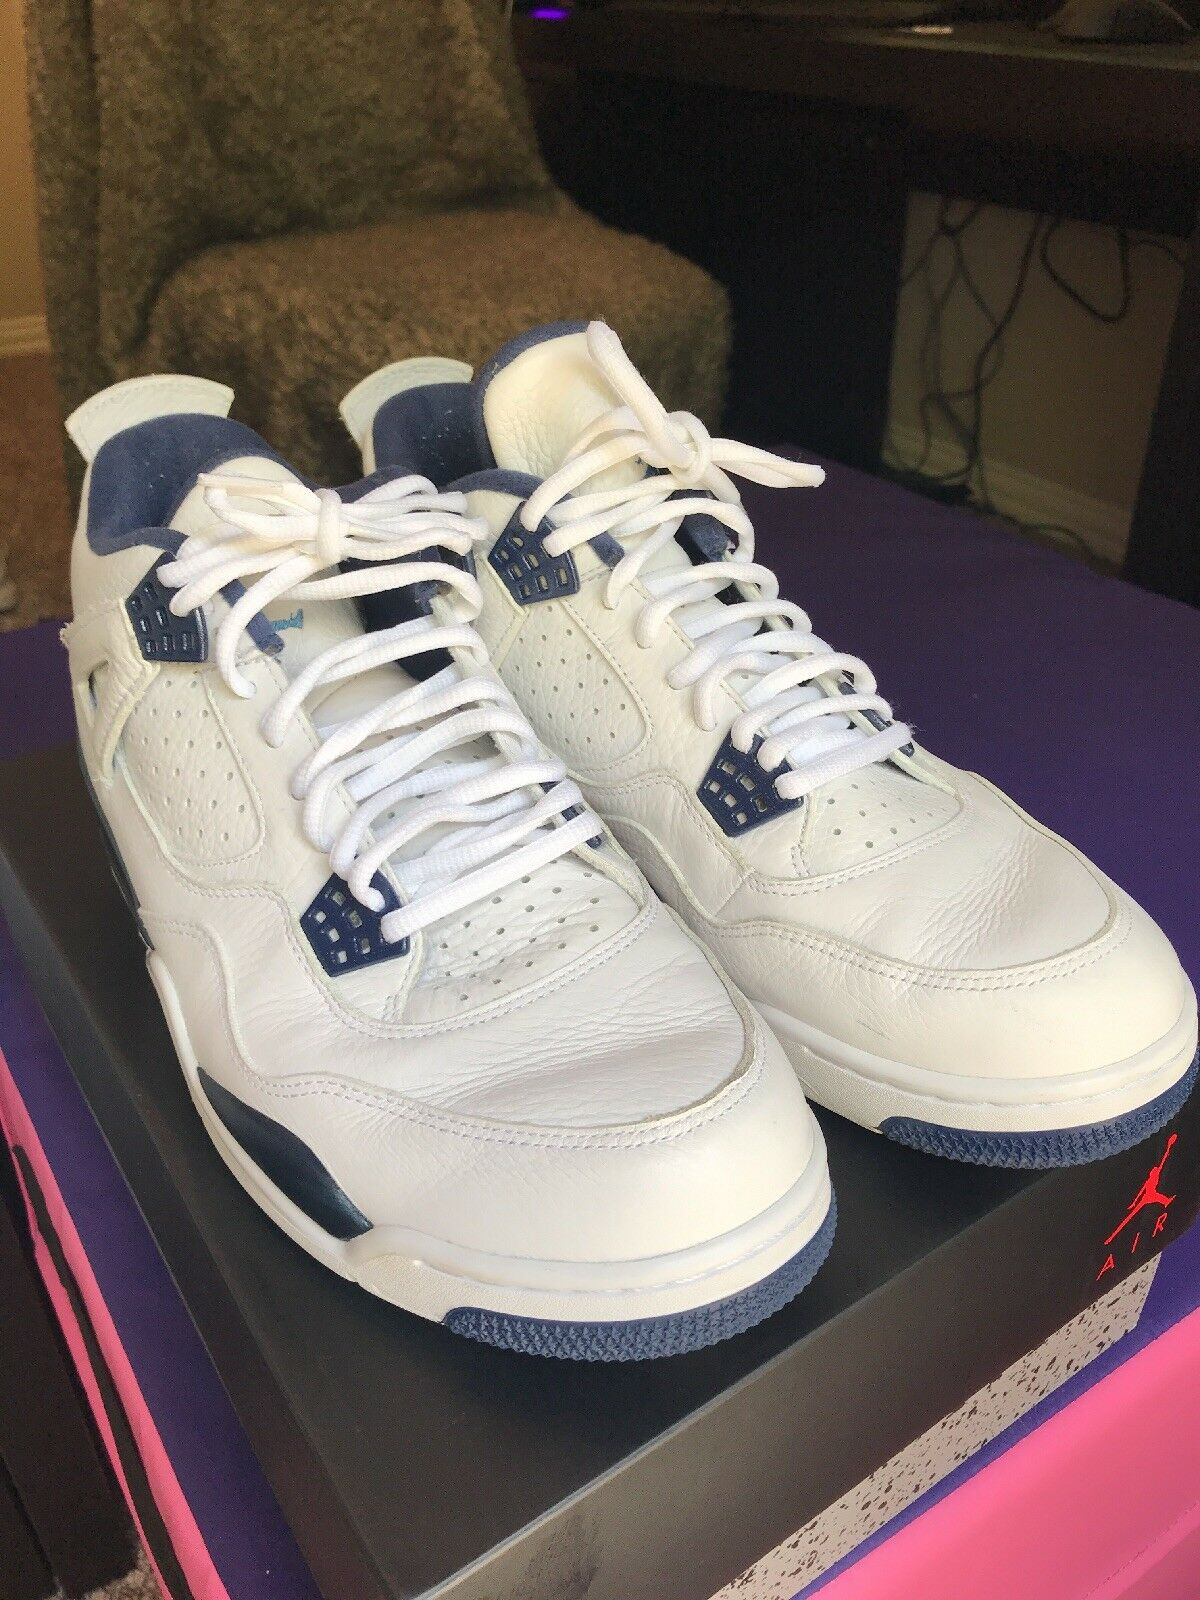 Jordan 4 Columbia Size 12 men's